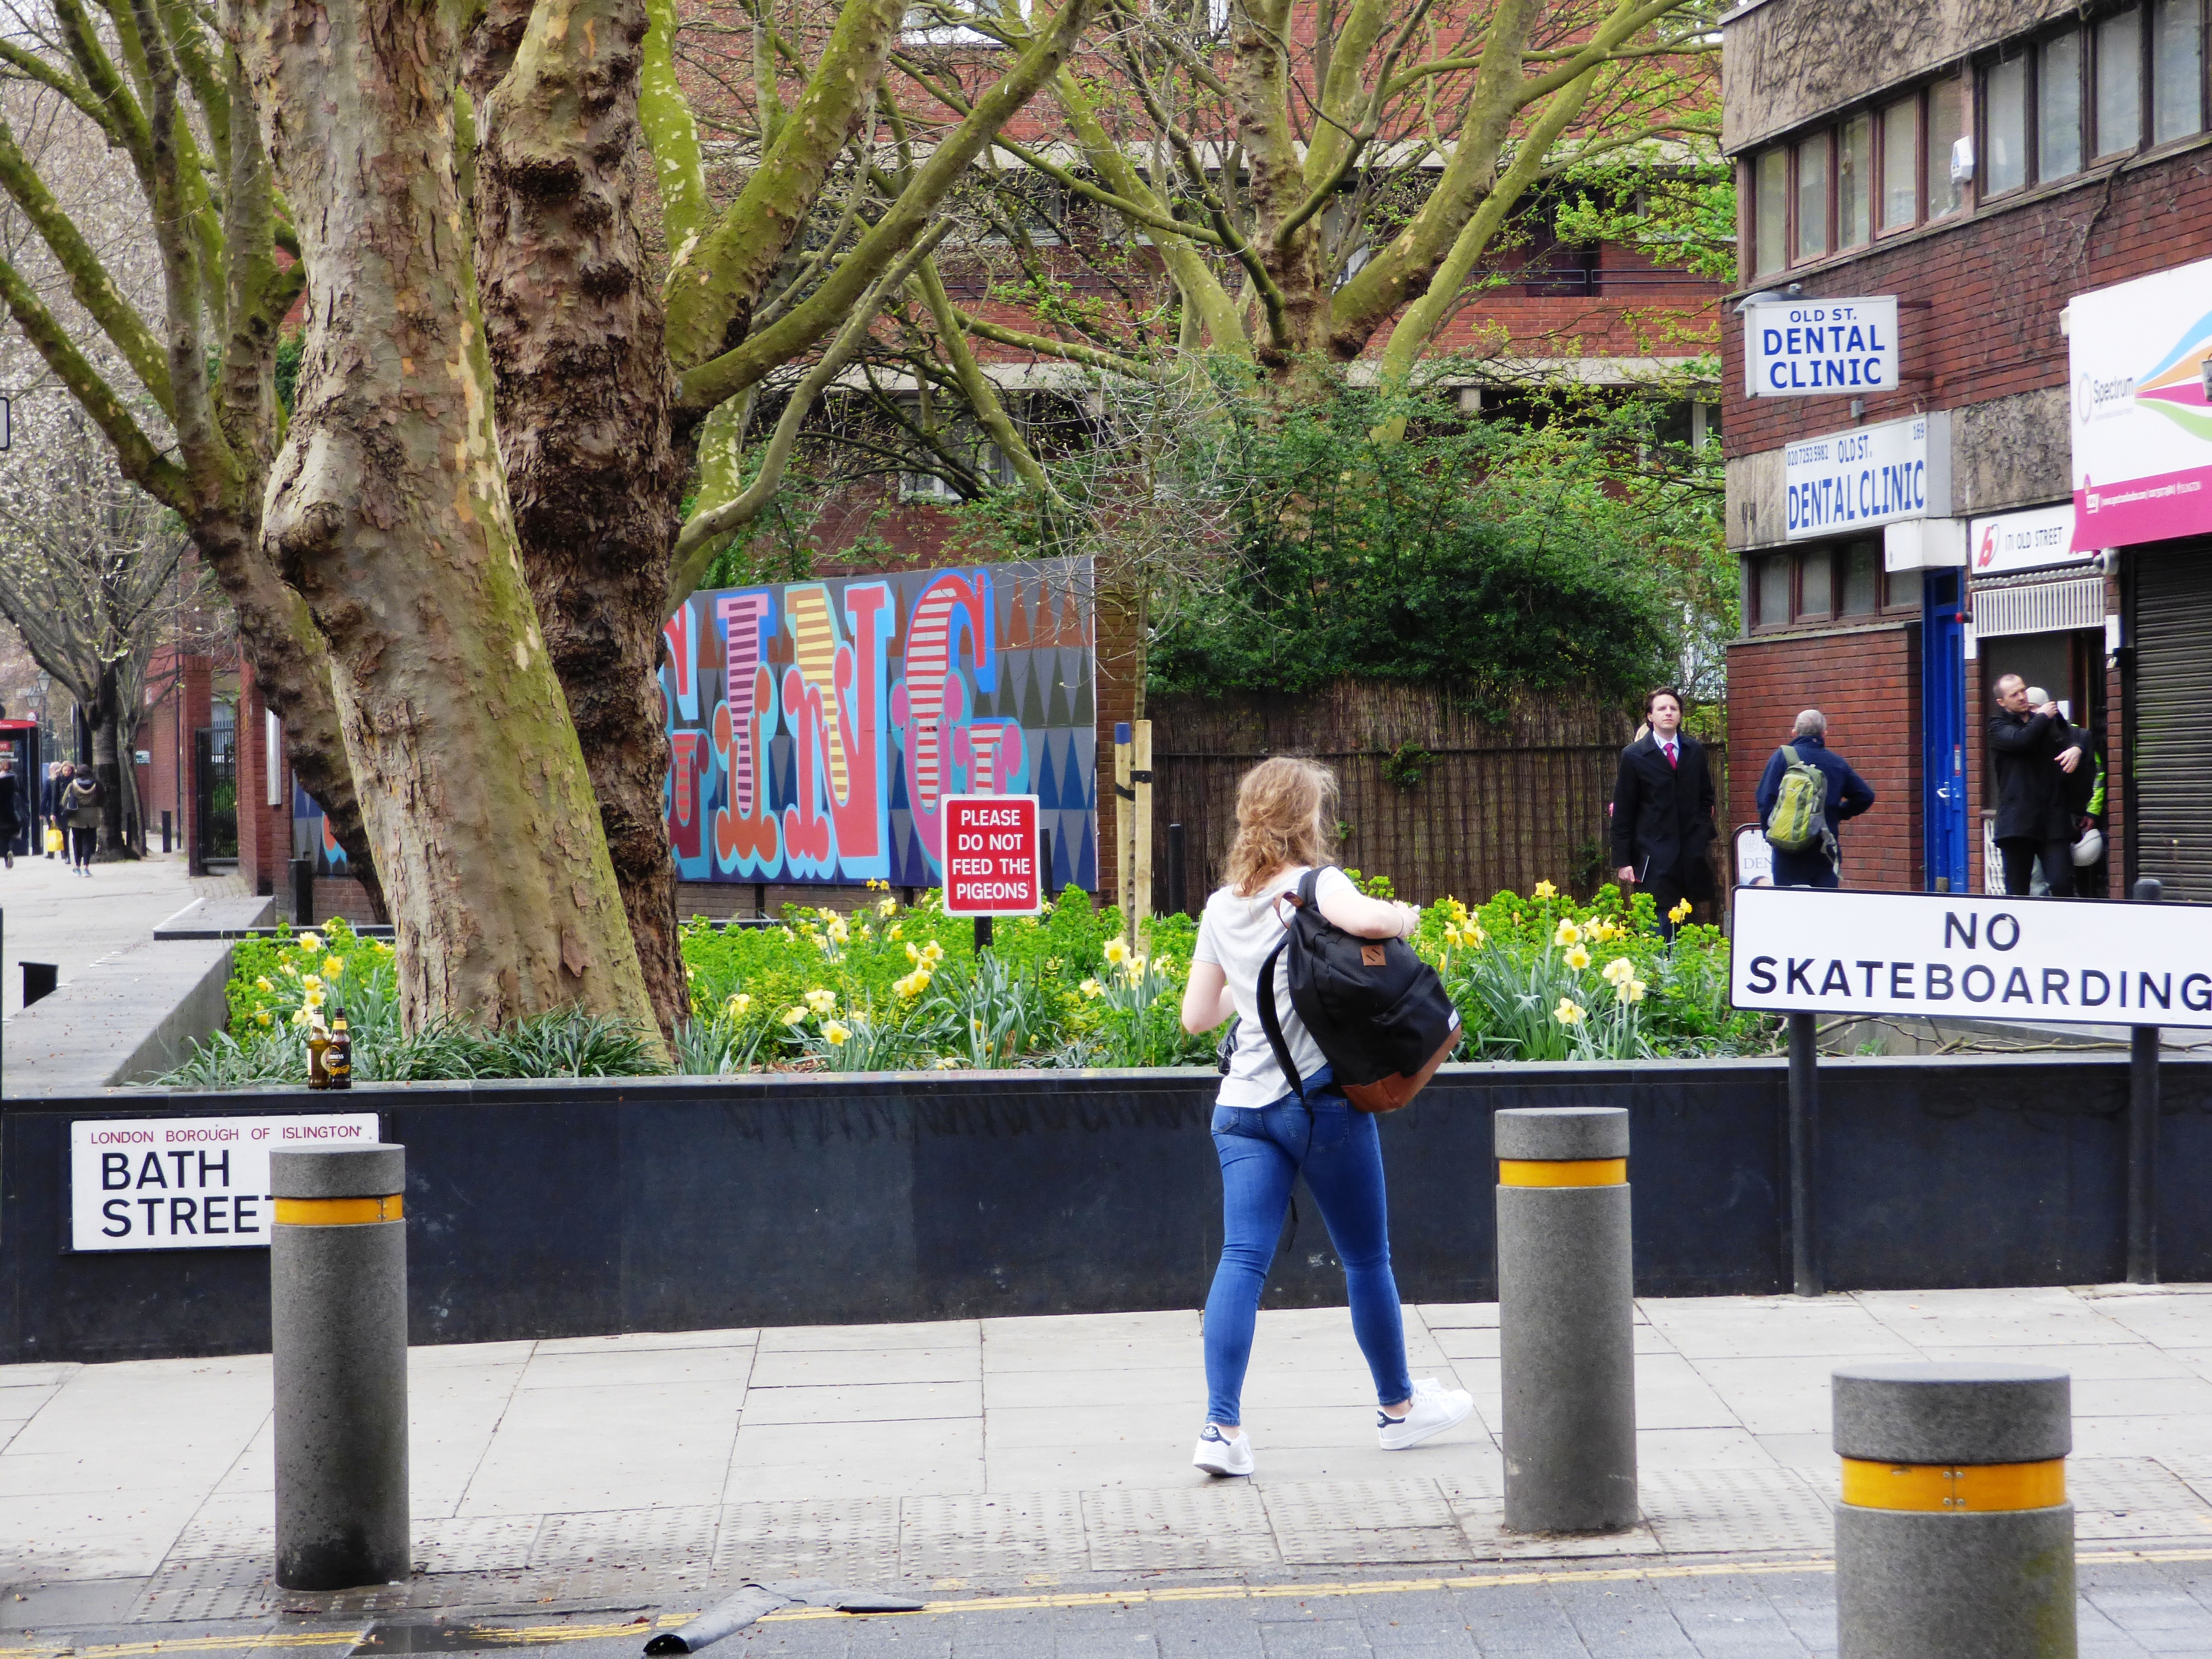 20170323_Islington_Bath-Street_No-Skateboarding-on-the-daffodils